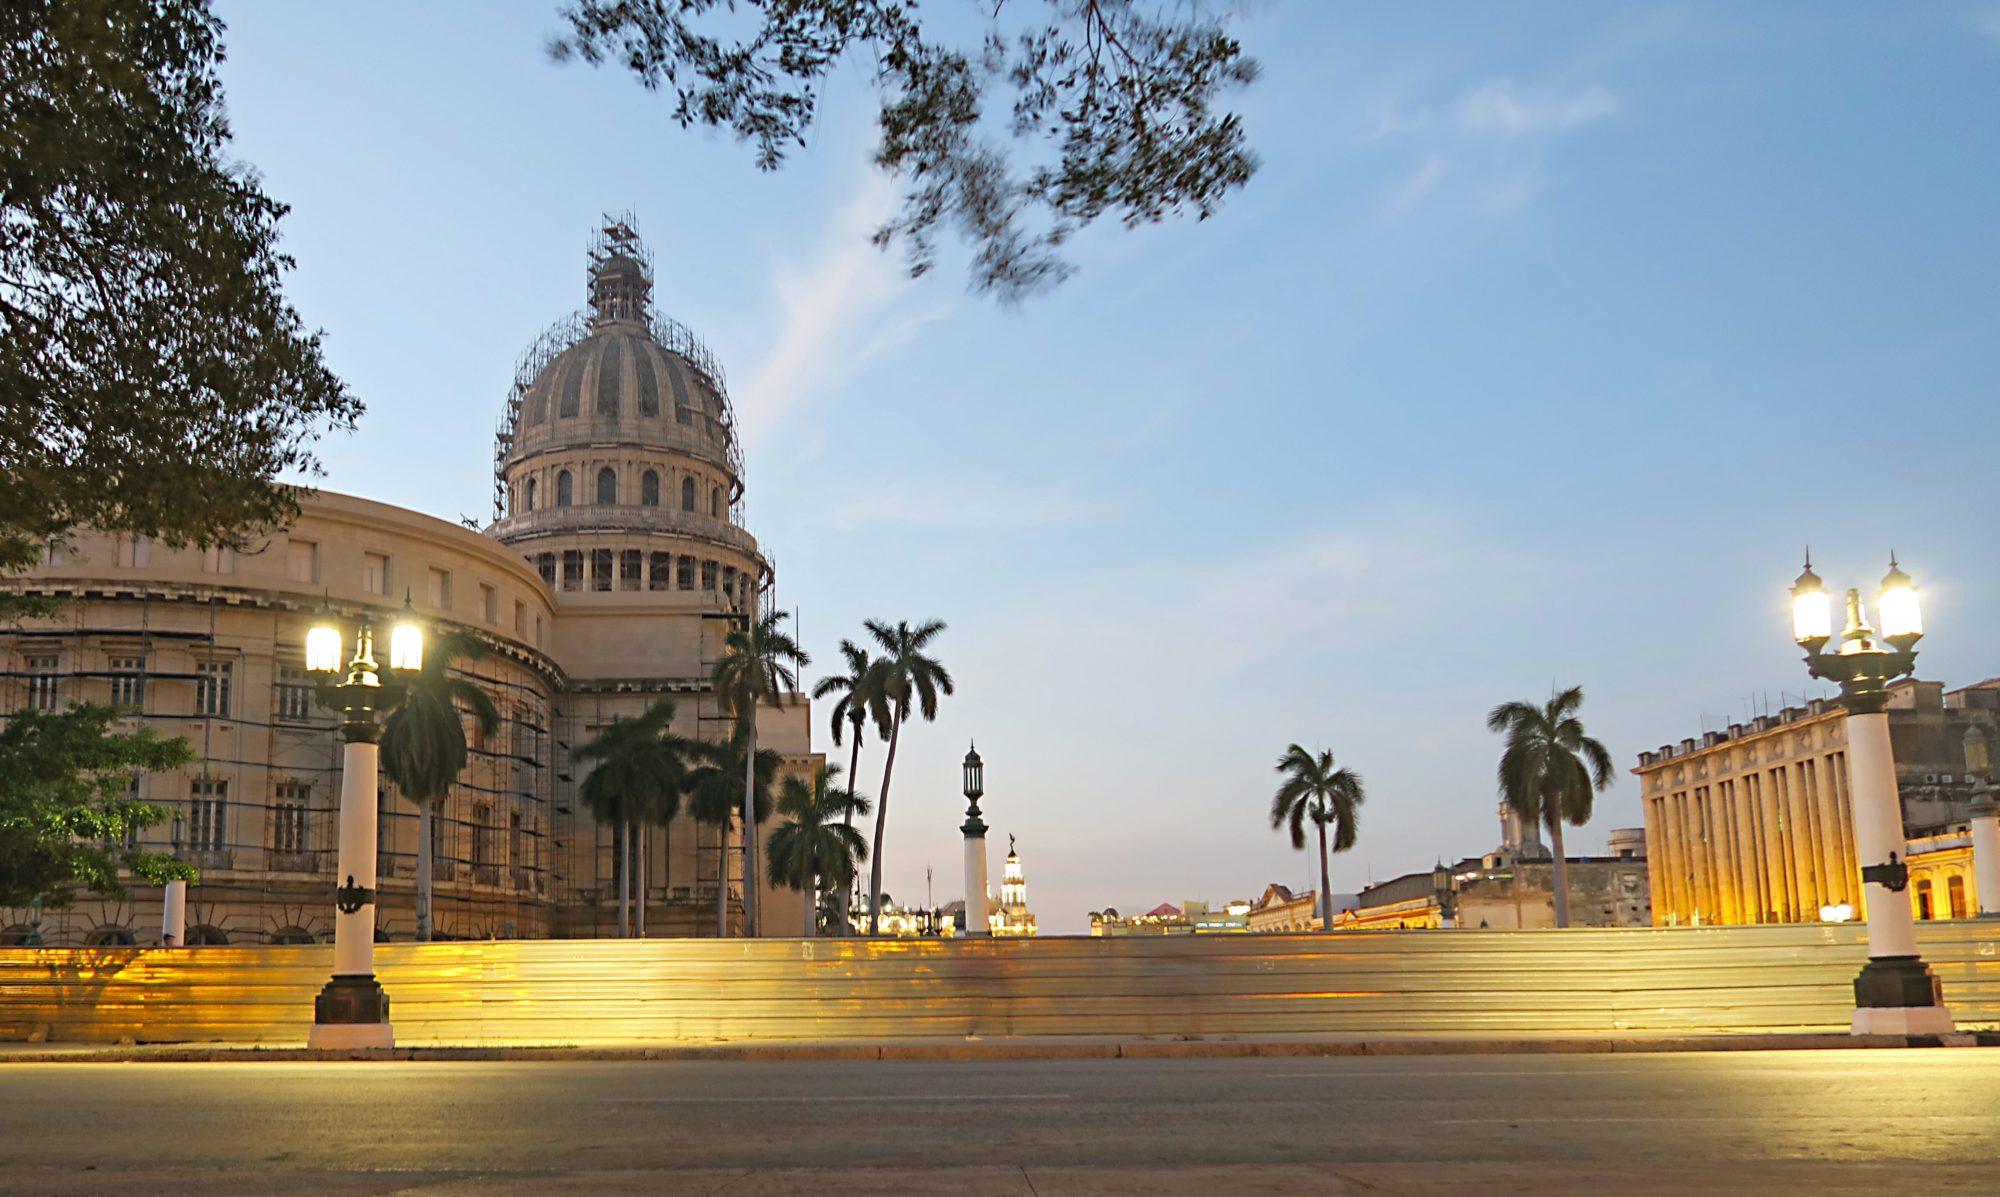 kuba, havanna, kapitol, parlamentsgebäude und sehenswürdigkeit